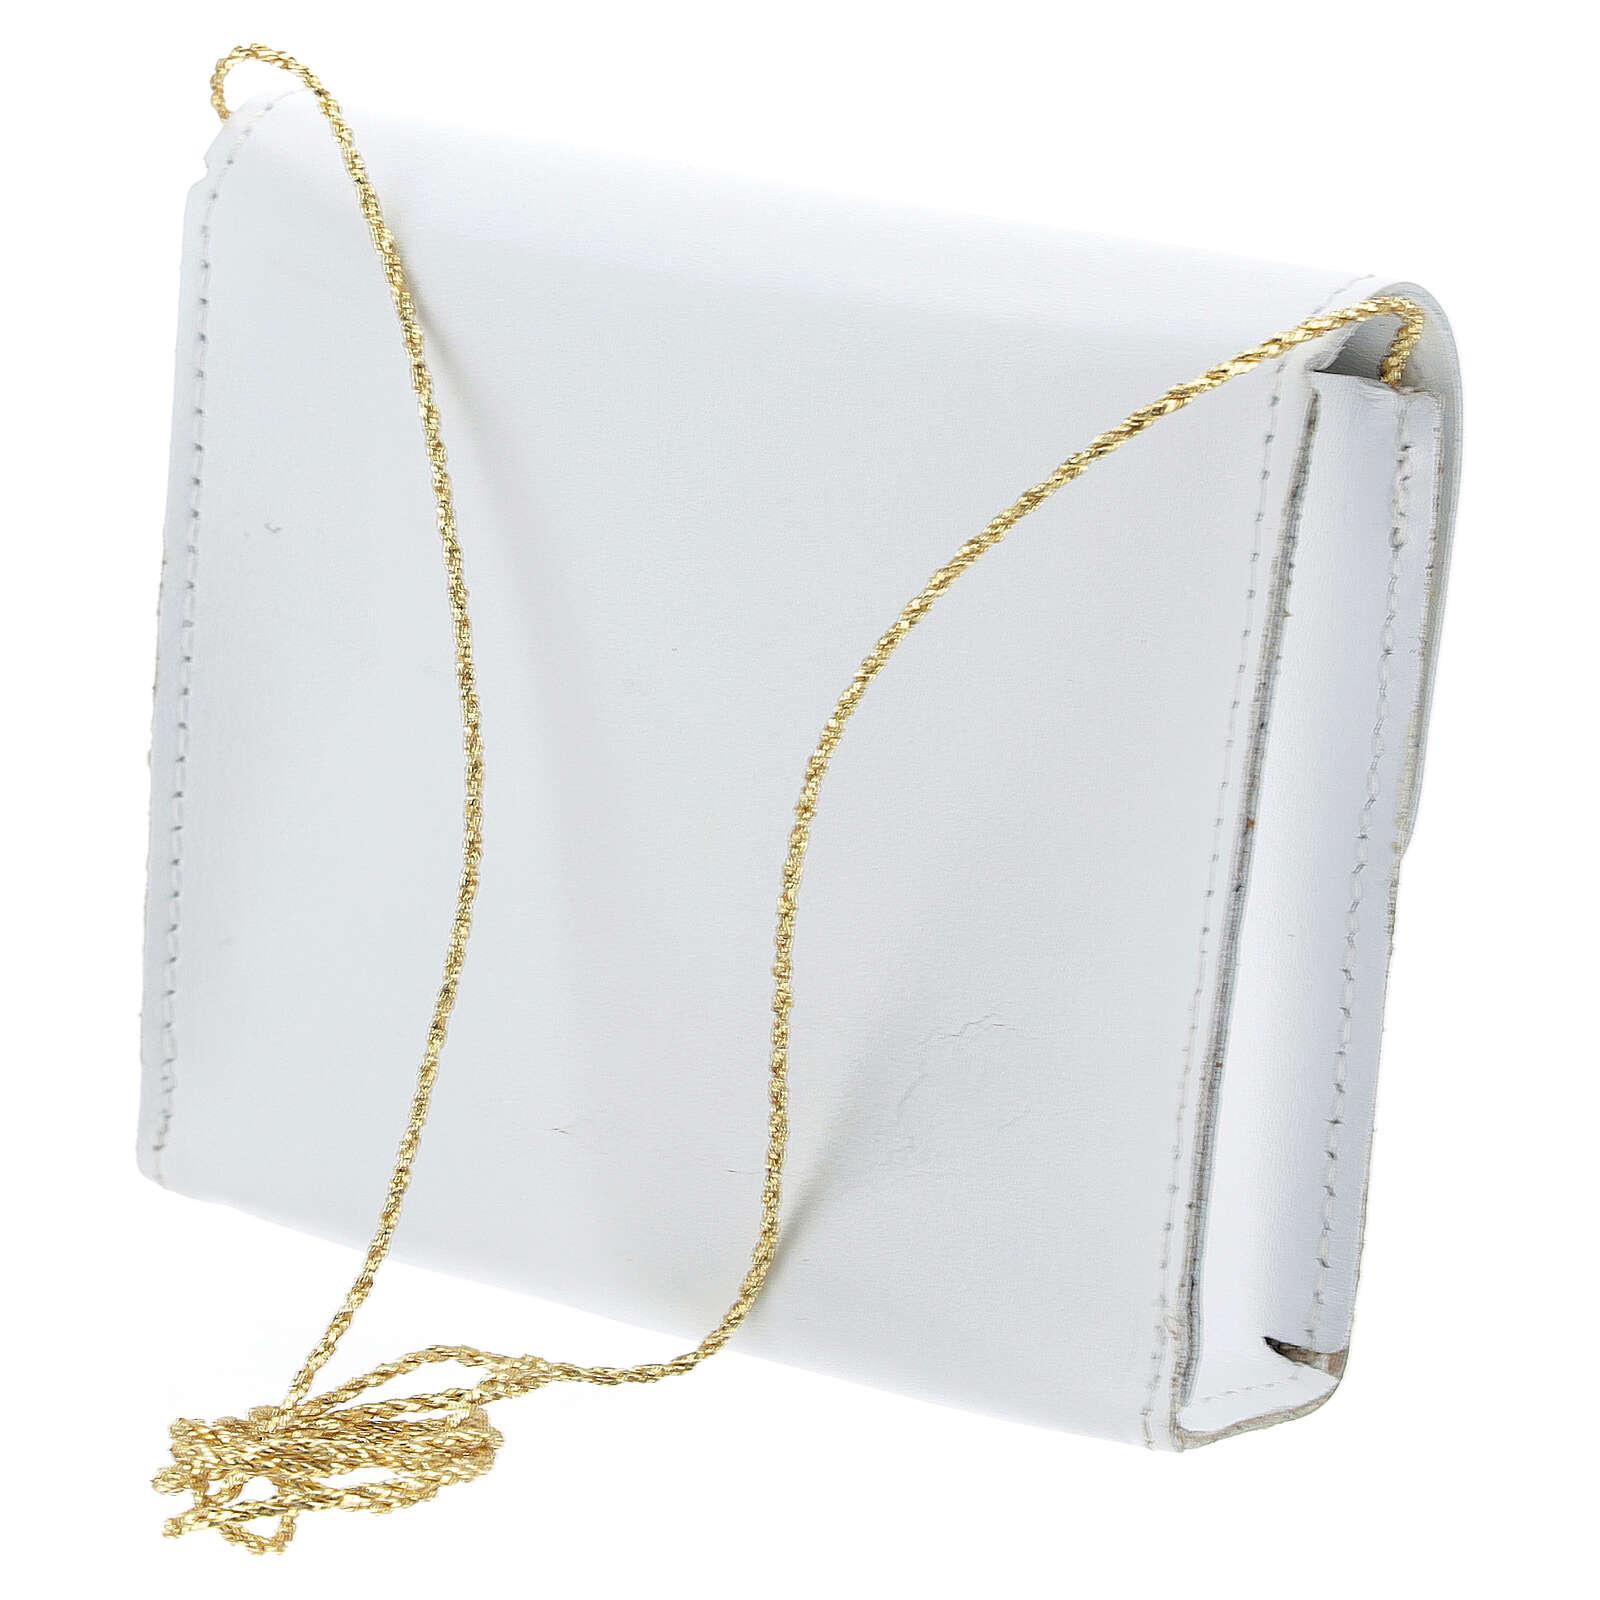 Paten bag 10x12 cm in white leather 4